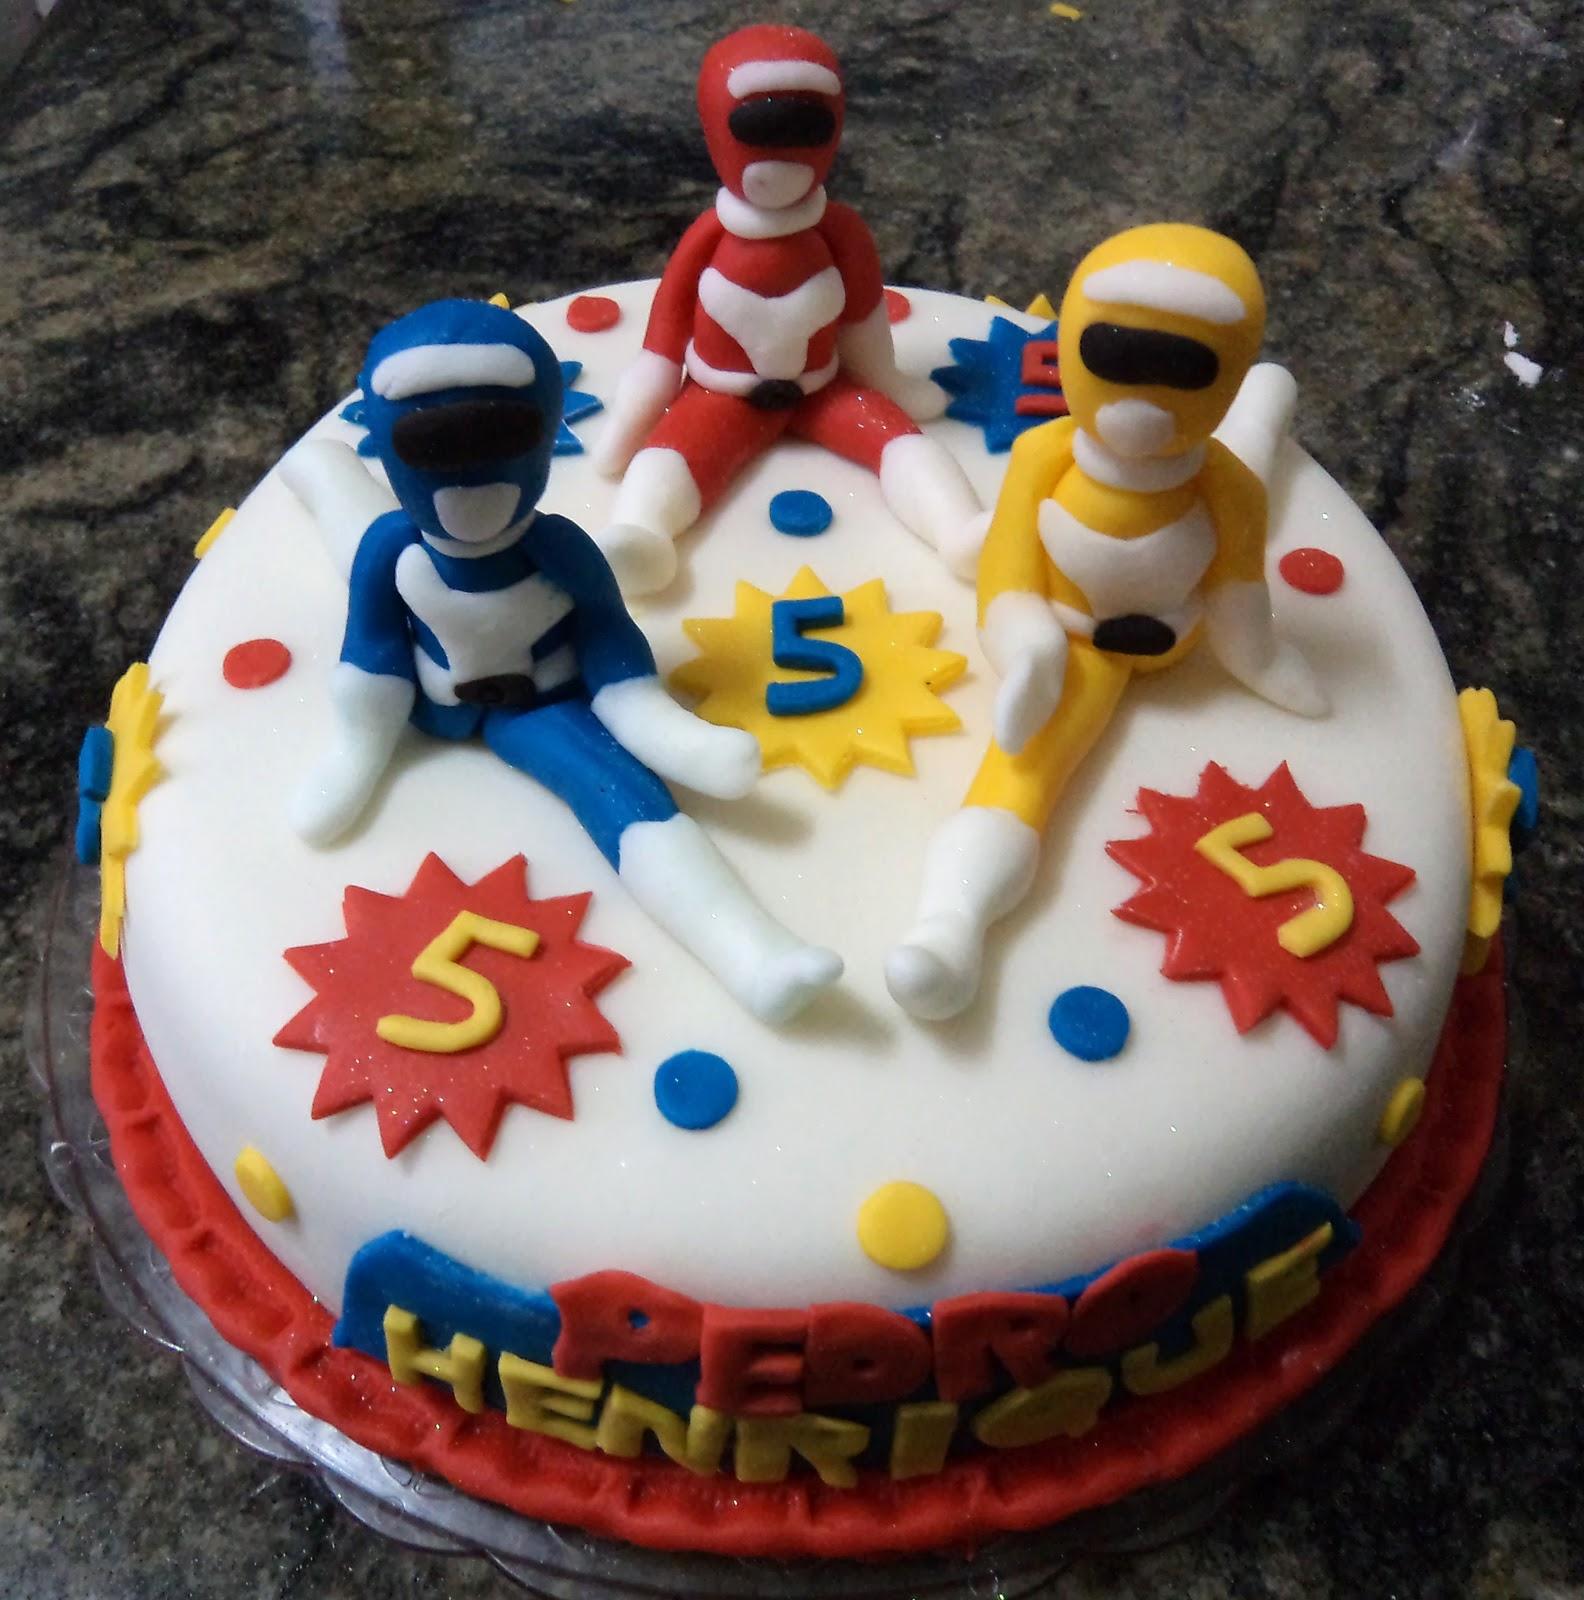 Power Rangers Birthday Cake.Power Ranger Cakes Decoration Ideas Little Birthday Cakes